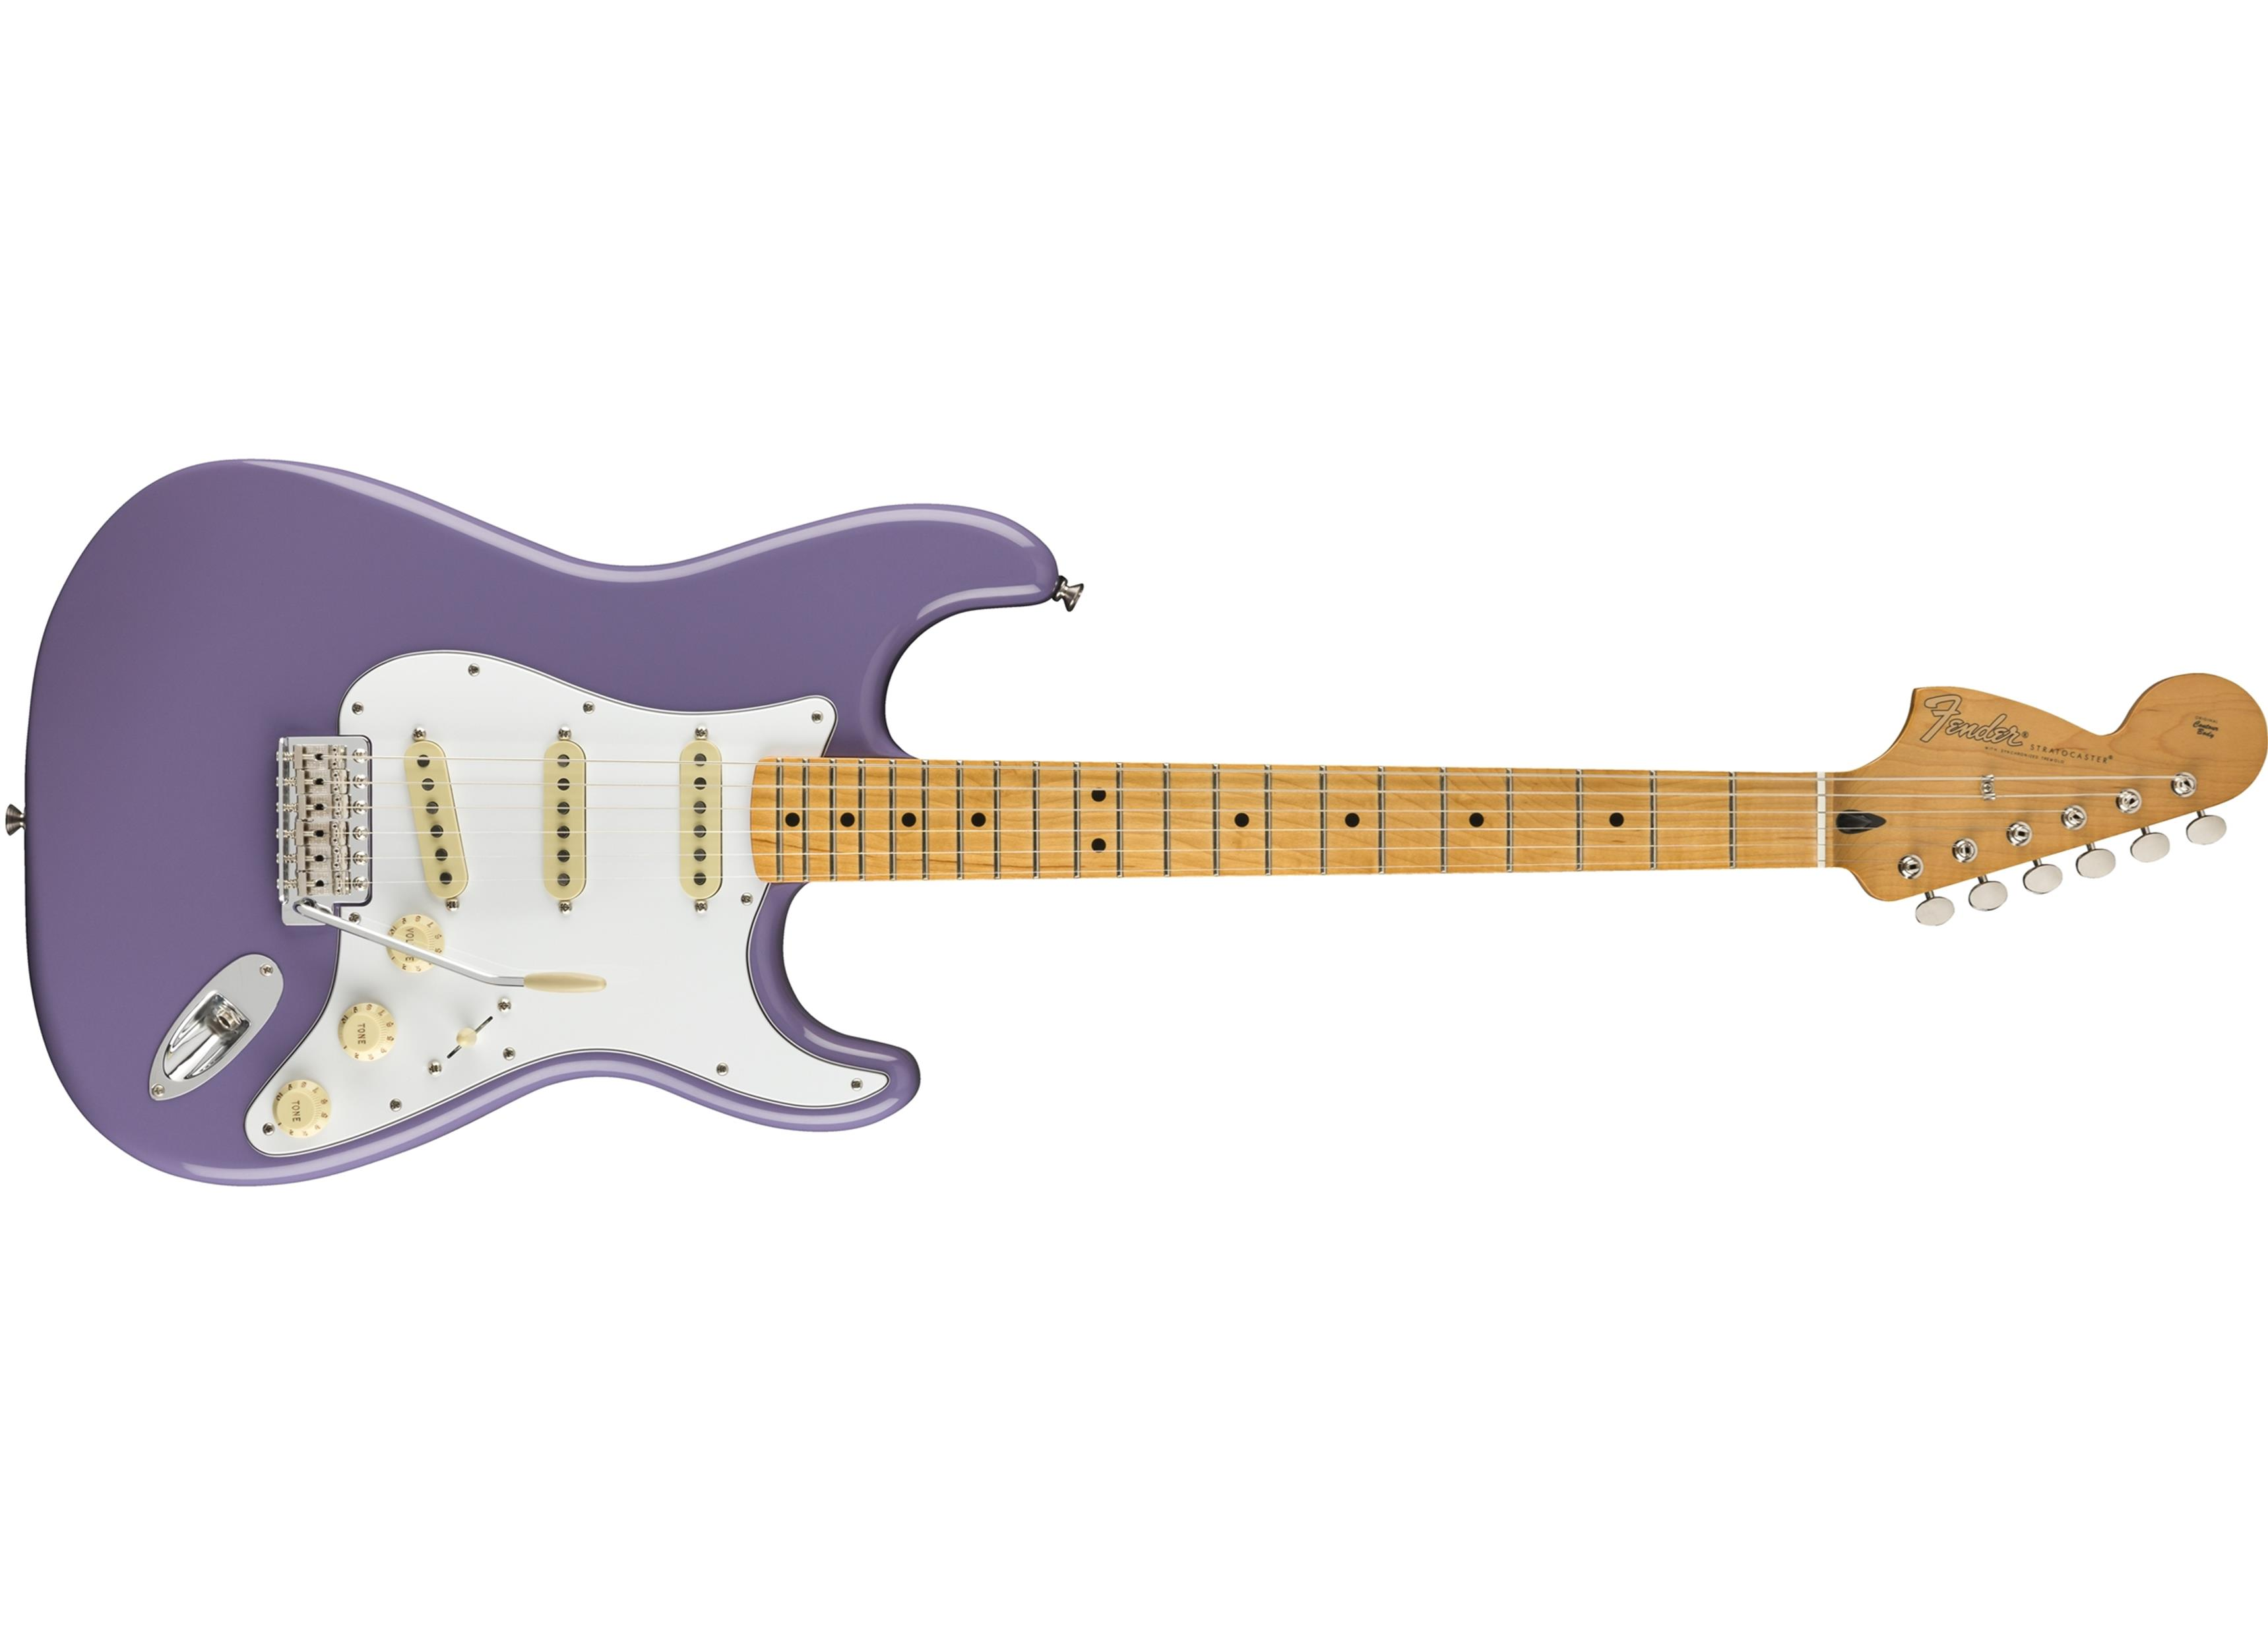 FENDER Jimi Hendrix Stratocaster MN Ultra Violet  0145802326